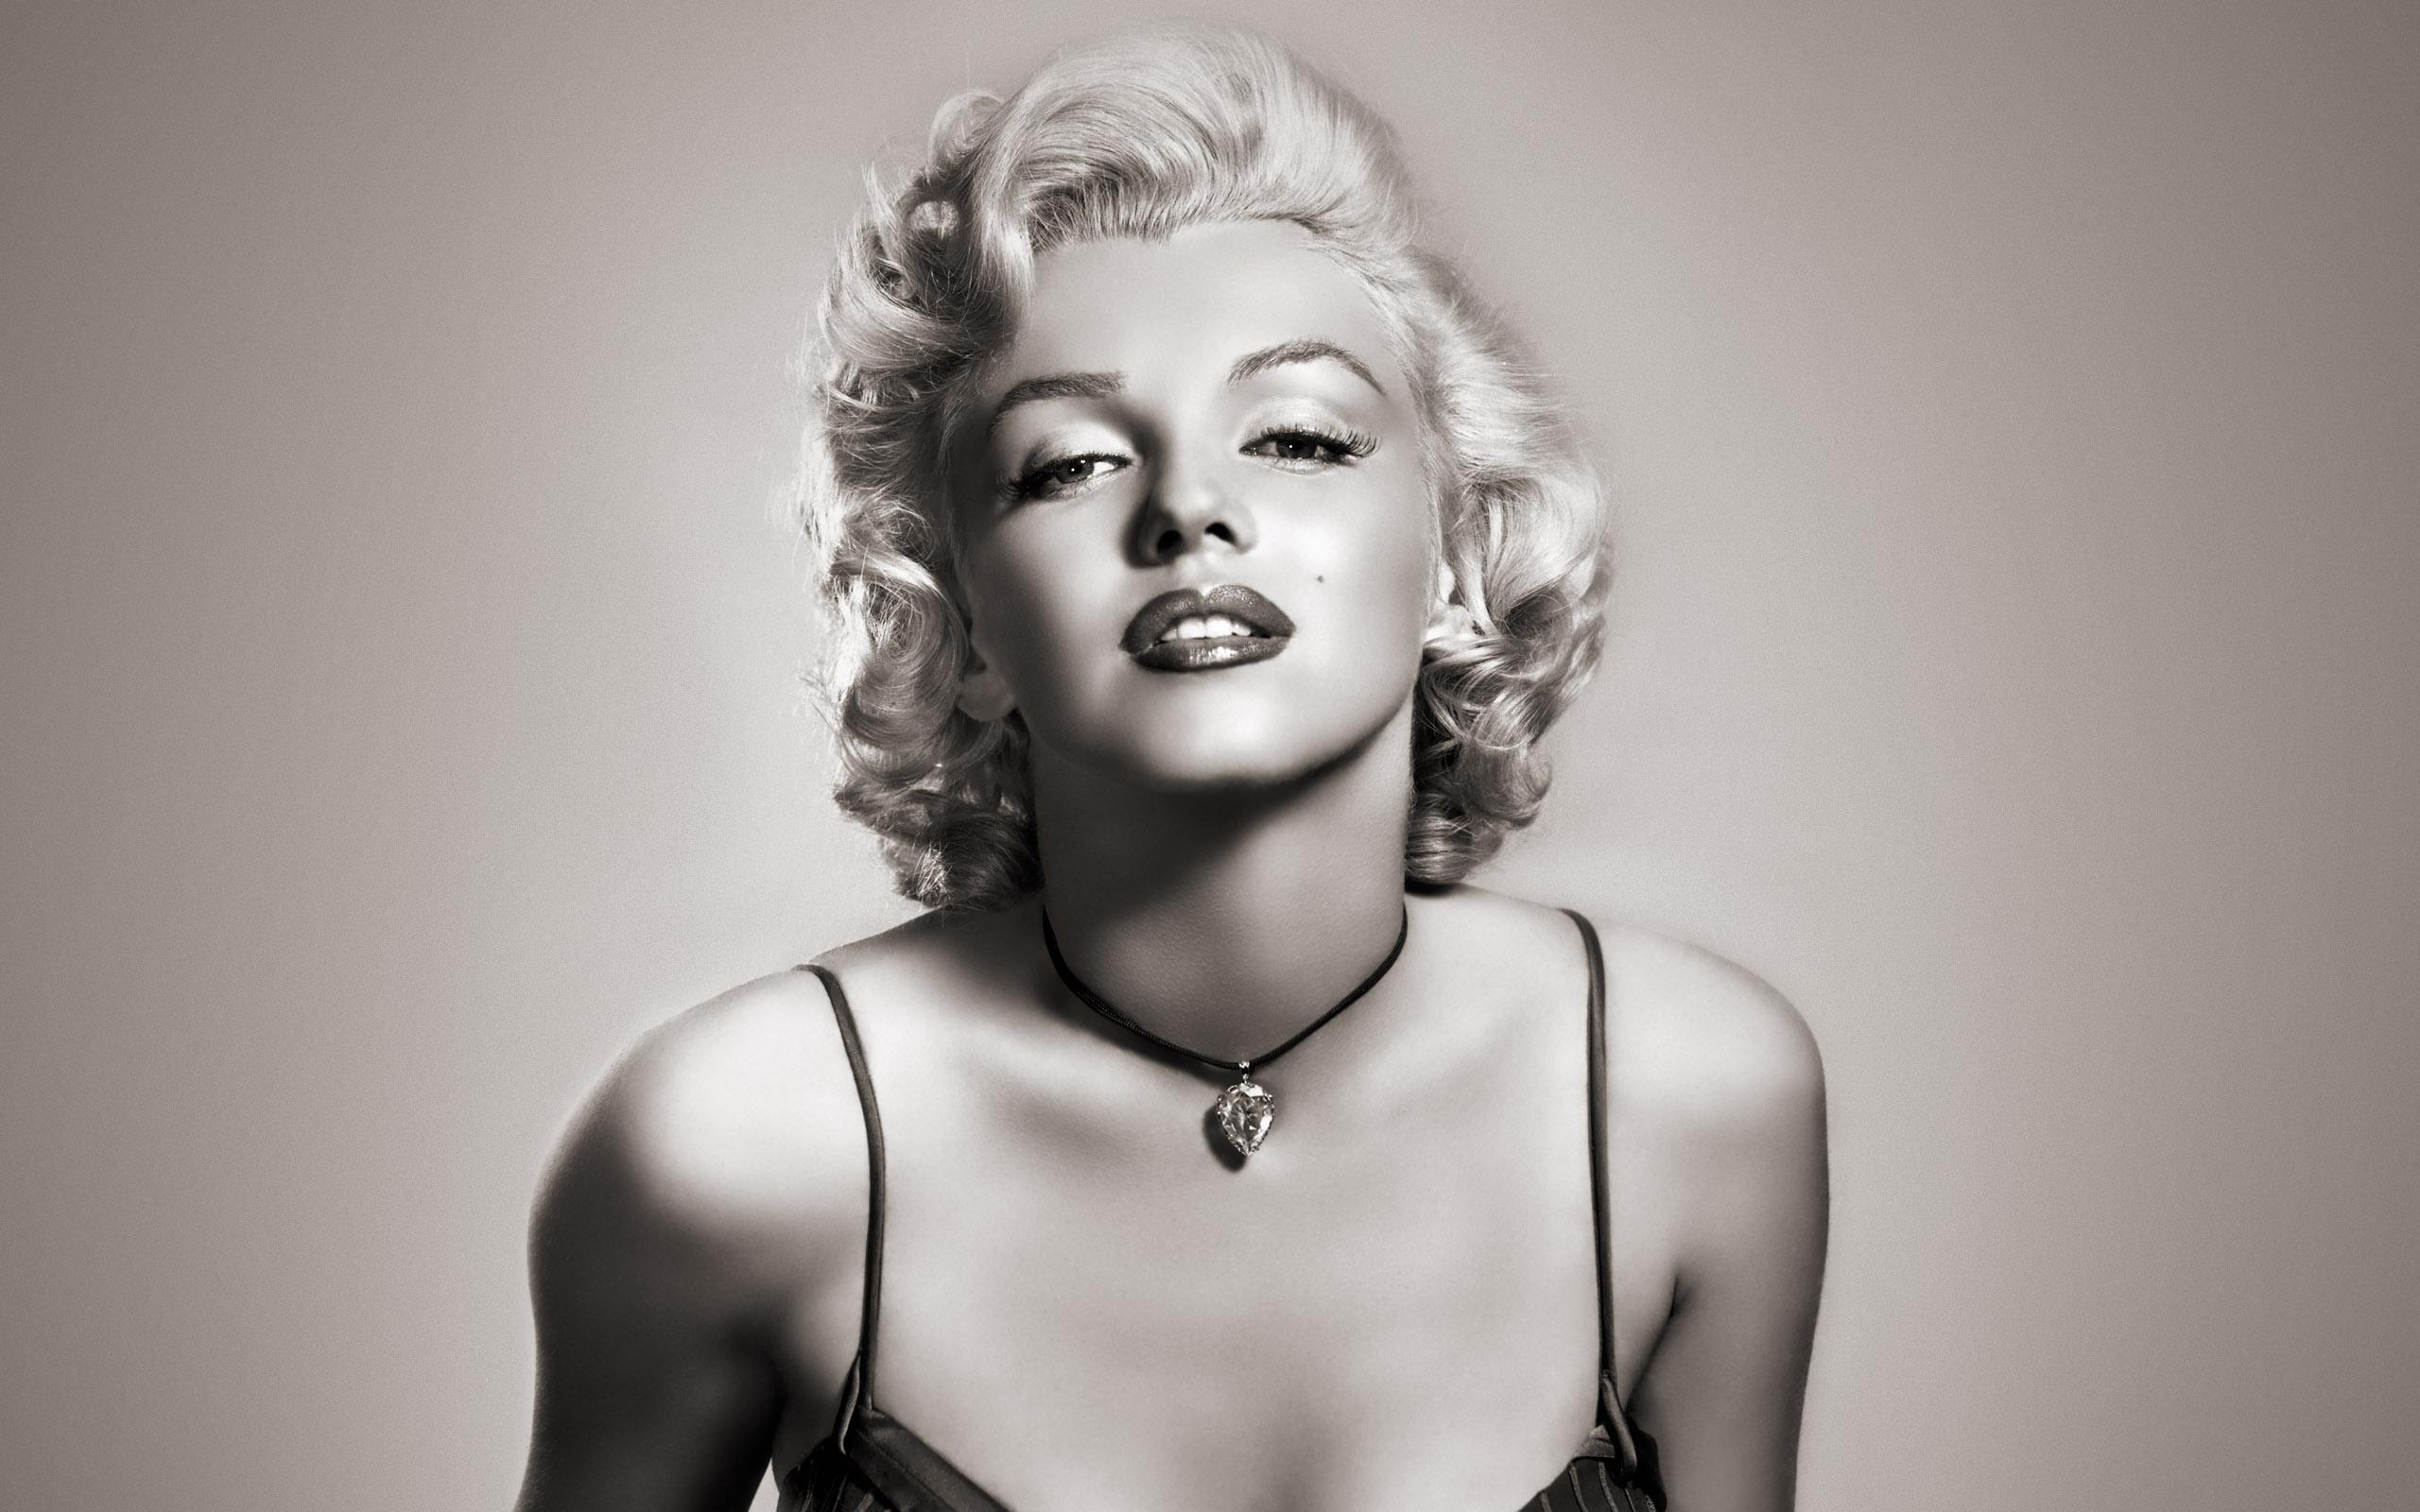 marilyn monroe wide Marilyn Monroe Plastic Surgery